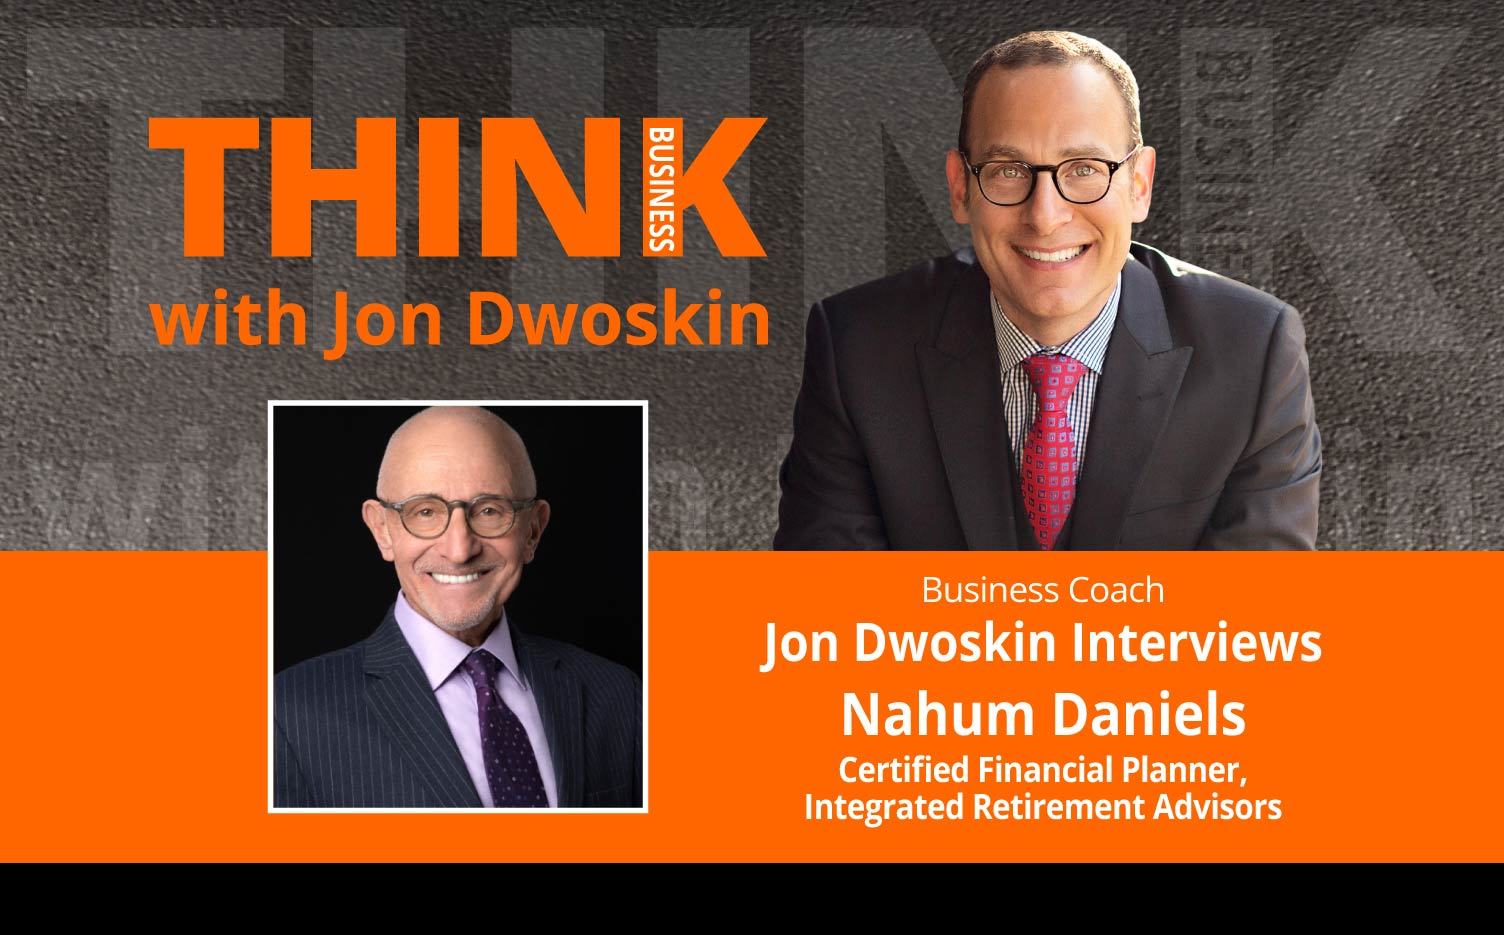 THINK Business Podcast: Jon Dwoskin Interviews Nahum Daniels, Certified Financial Planner, Integrated Retirement Advisors